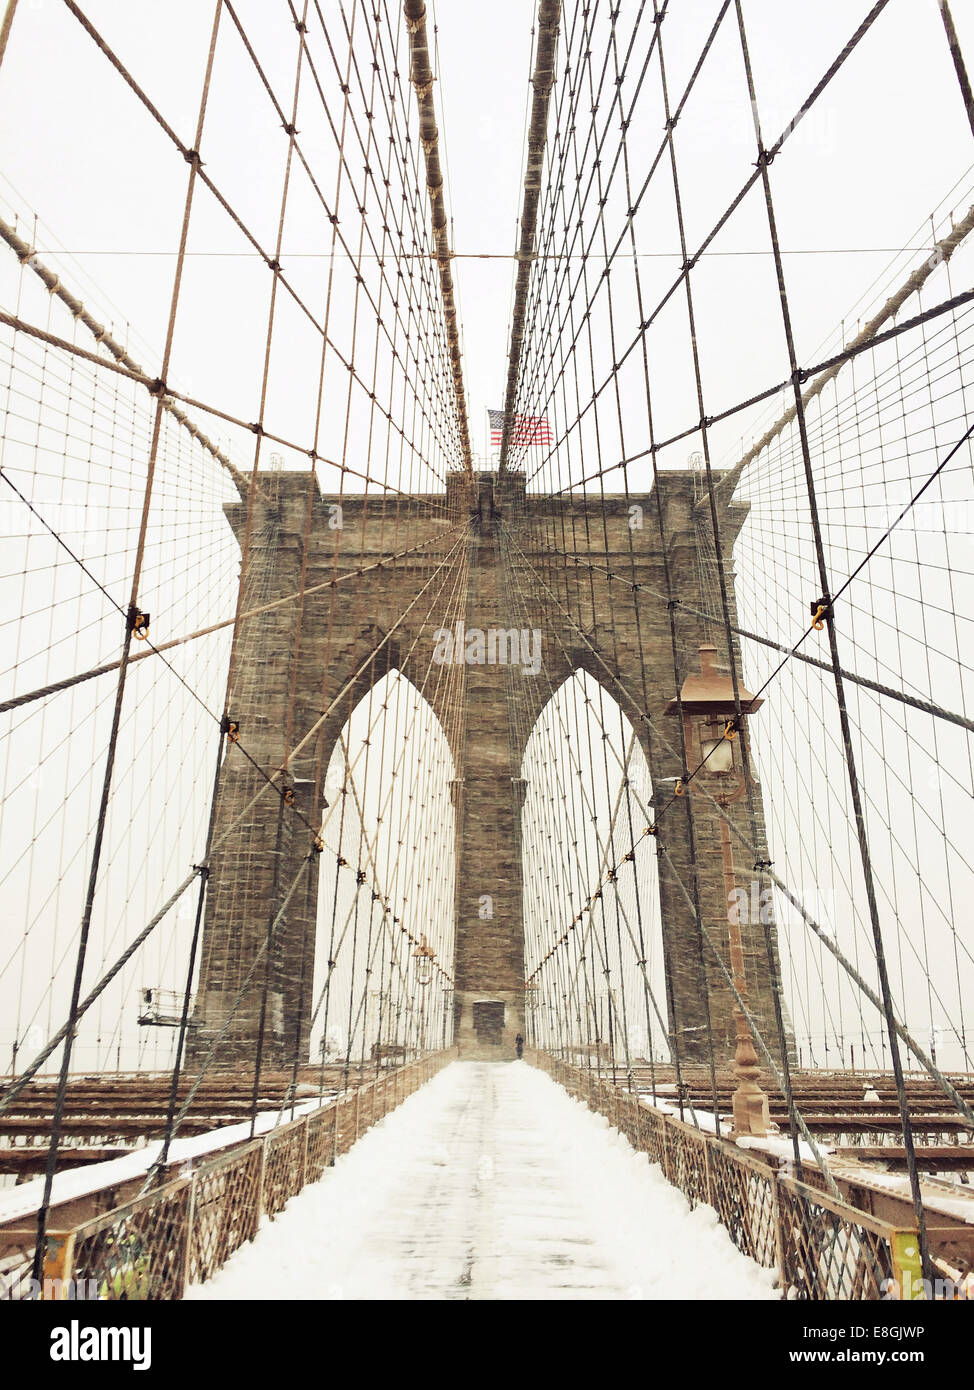 Brooklyn Bridge im Schnee, New York, Amerika, USA Stockbild